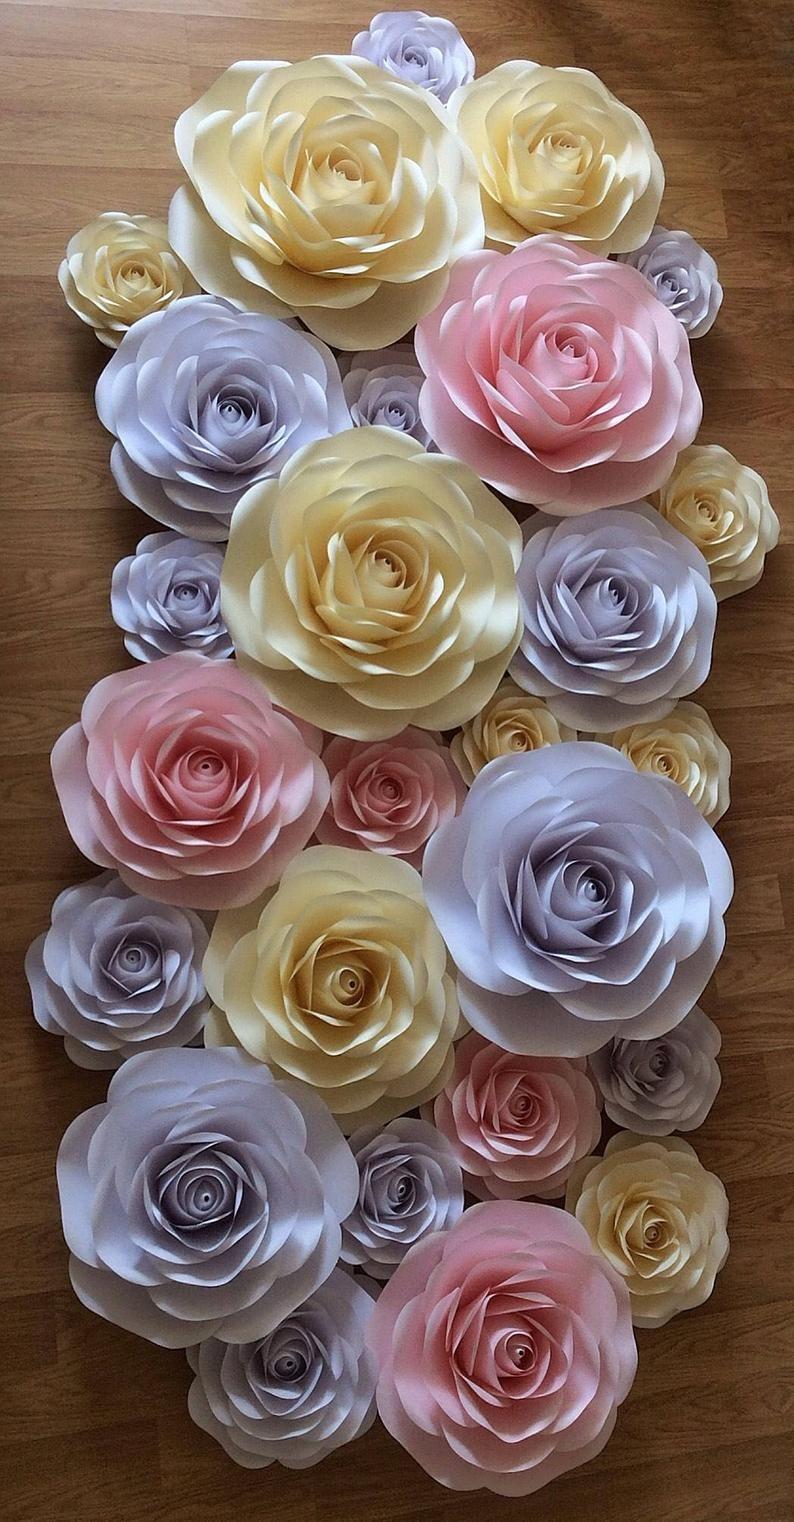 Paper Flowers-Wedding Decor-Set Paper Flowers-Large Paper Flowers-Nursery decor-Giant Paper Flowers-Large paper roses-Wall Decor-Backdrop #largepaperflowers